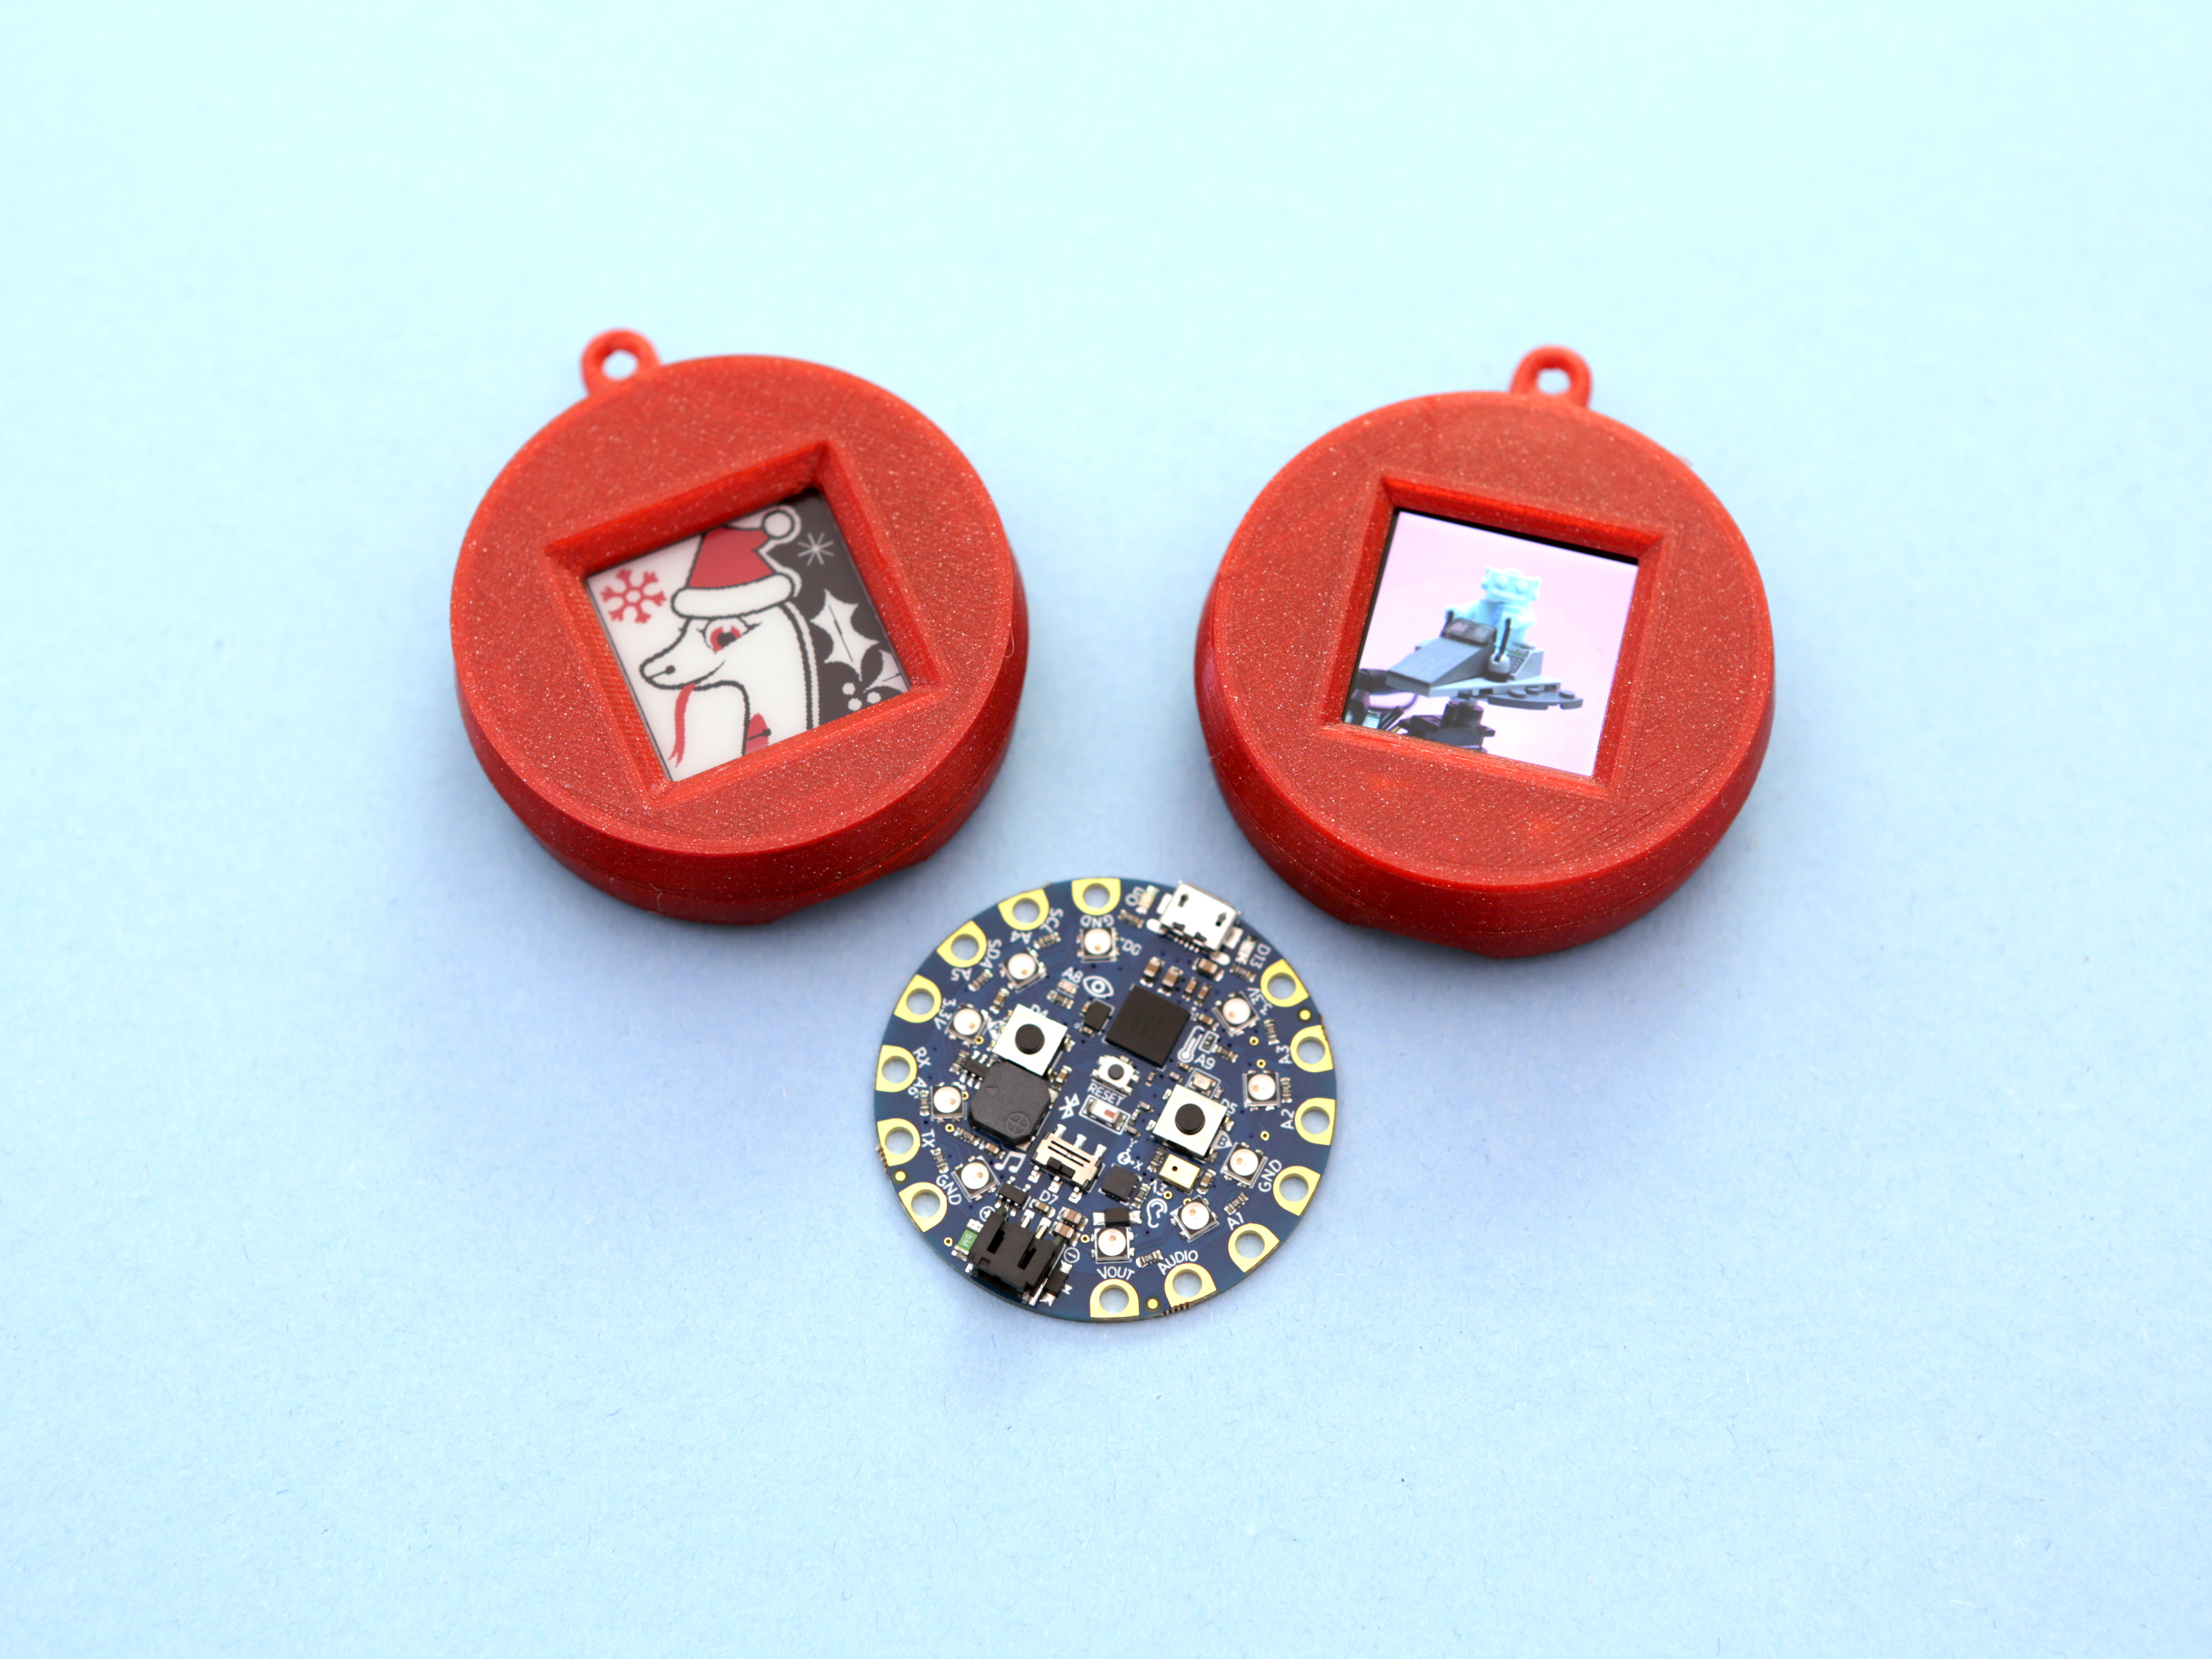 3d_printing_gizmo-ornaments.jpg